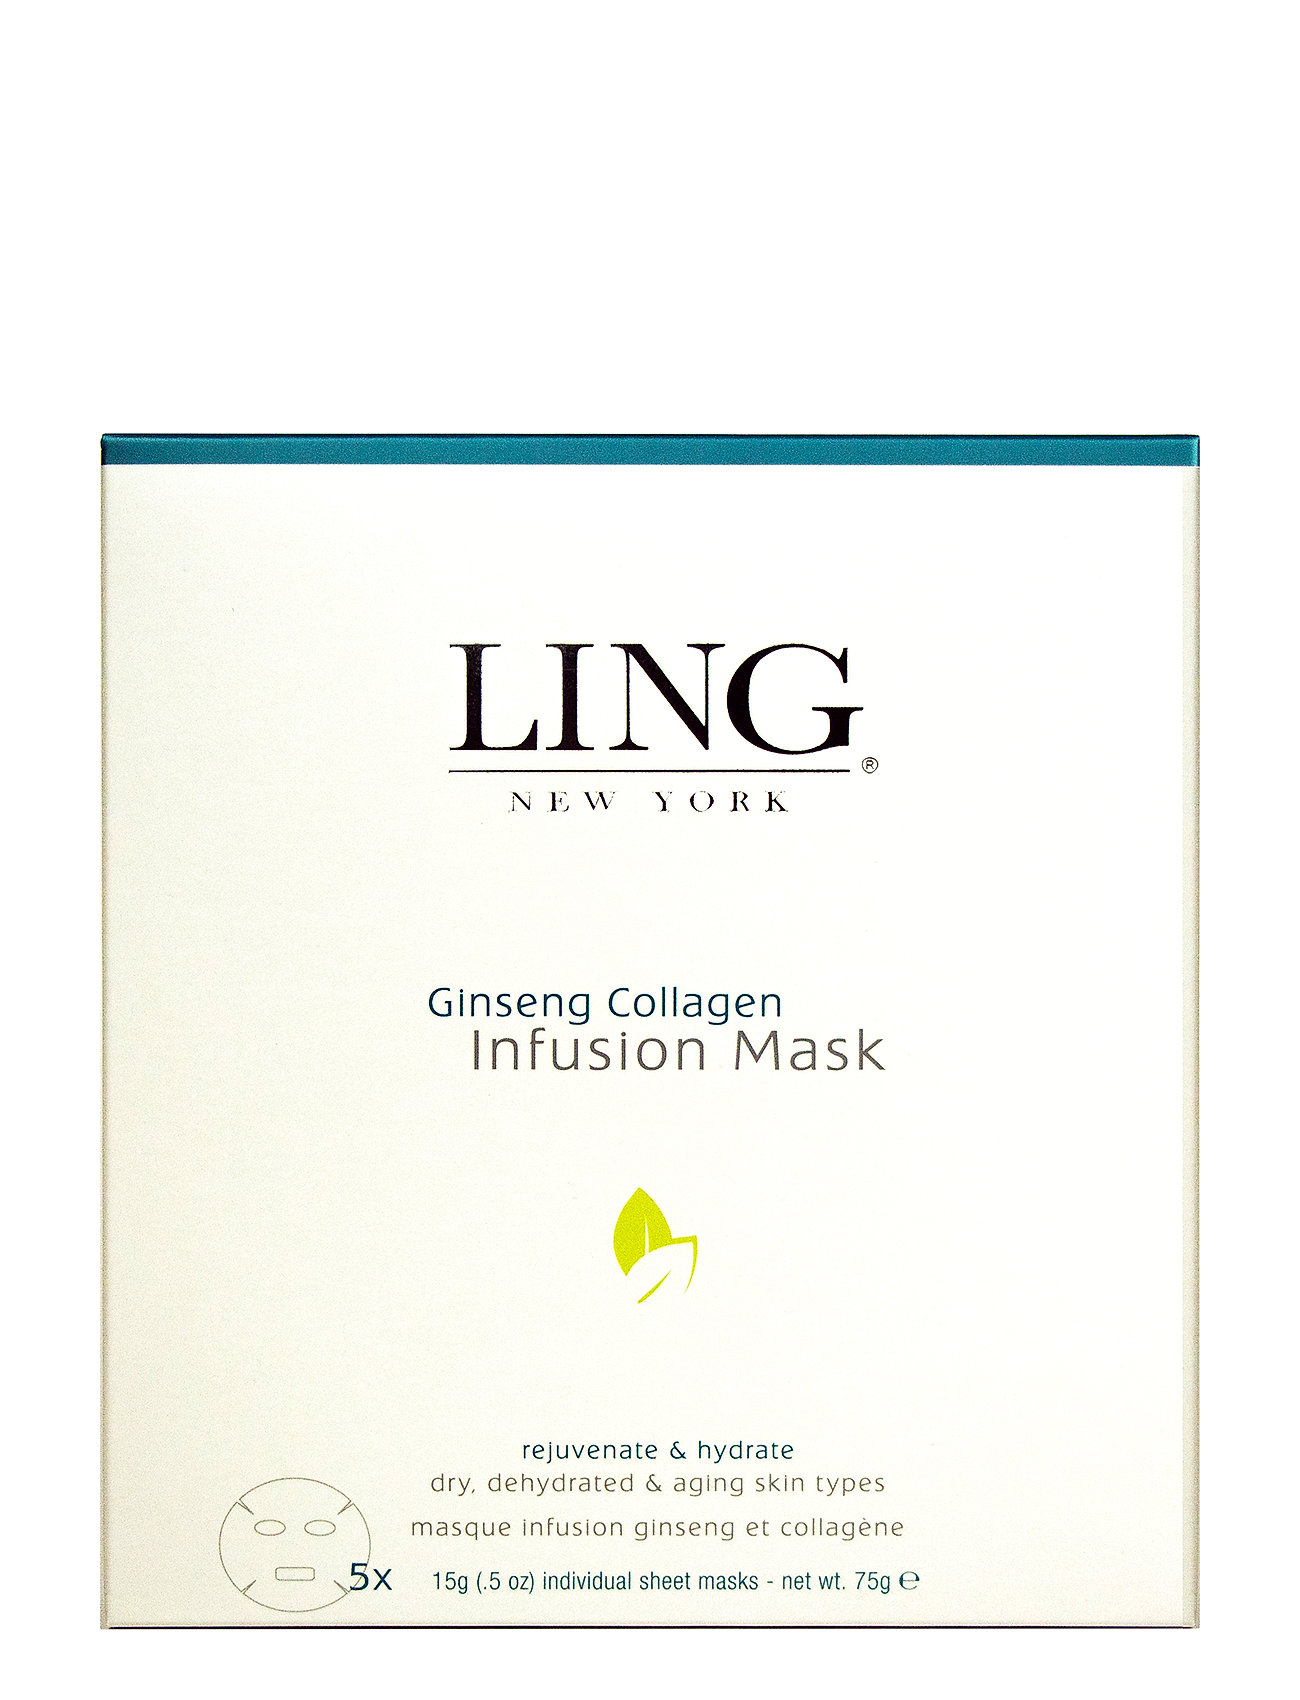 LING New York LG Gingseng Collagen Infusi Mask 5 sheet - NO COLOUR